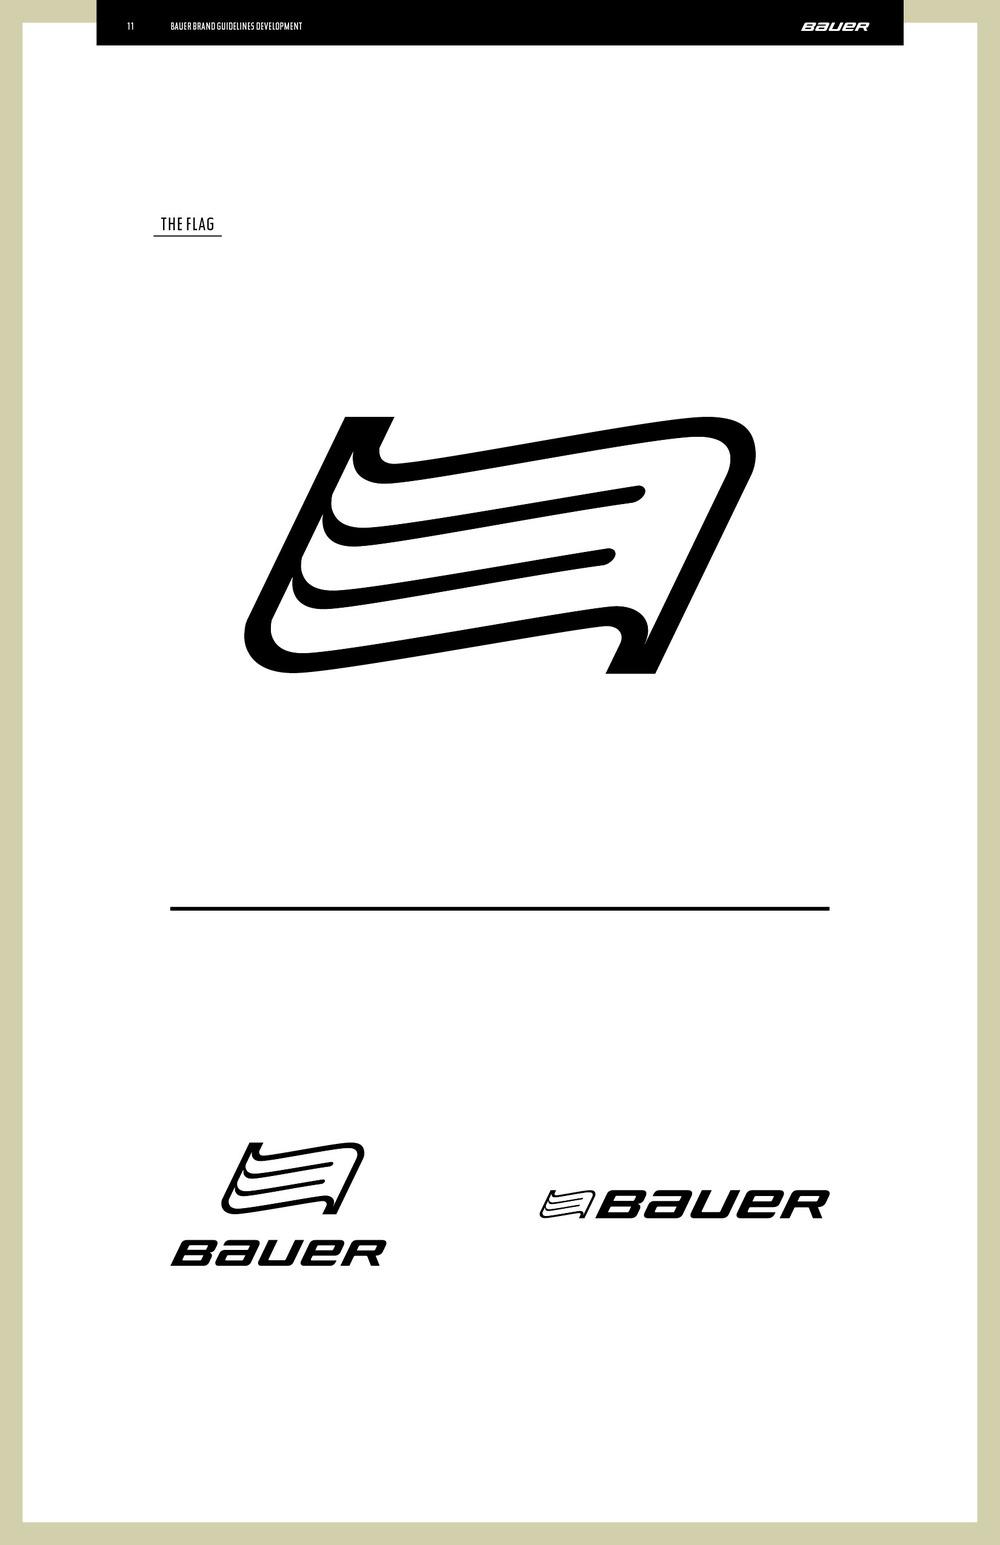 bauer_toolkit11.jpg